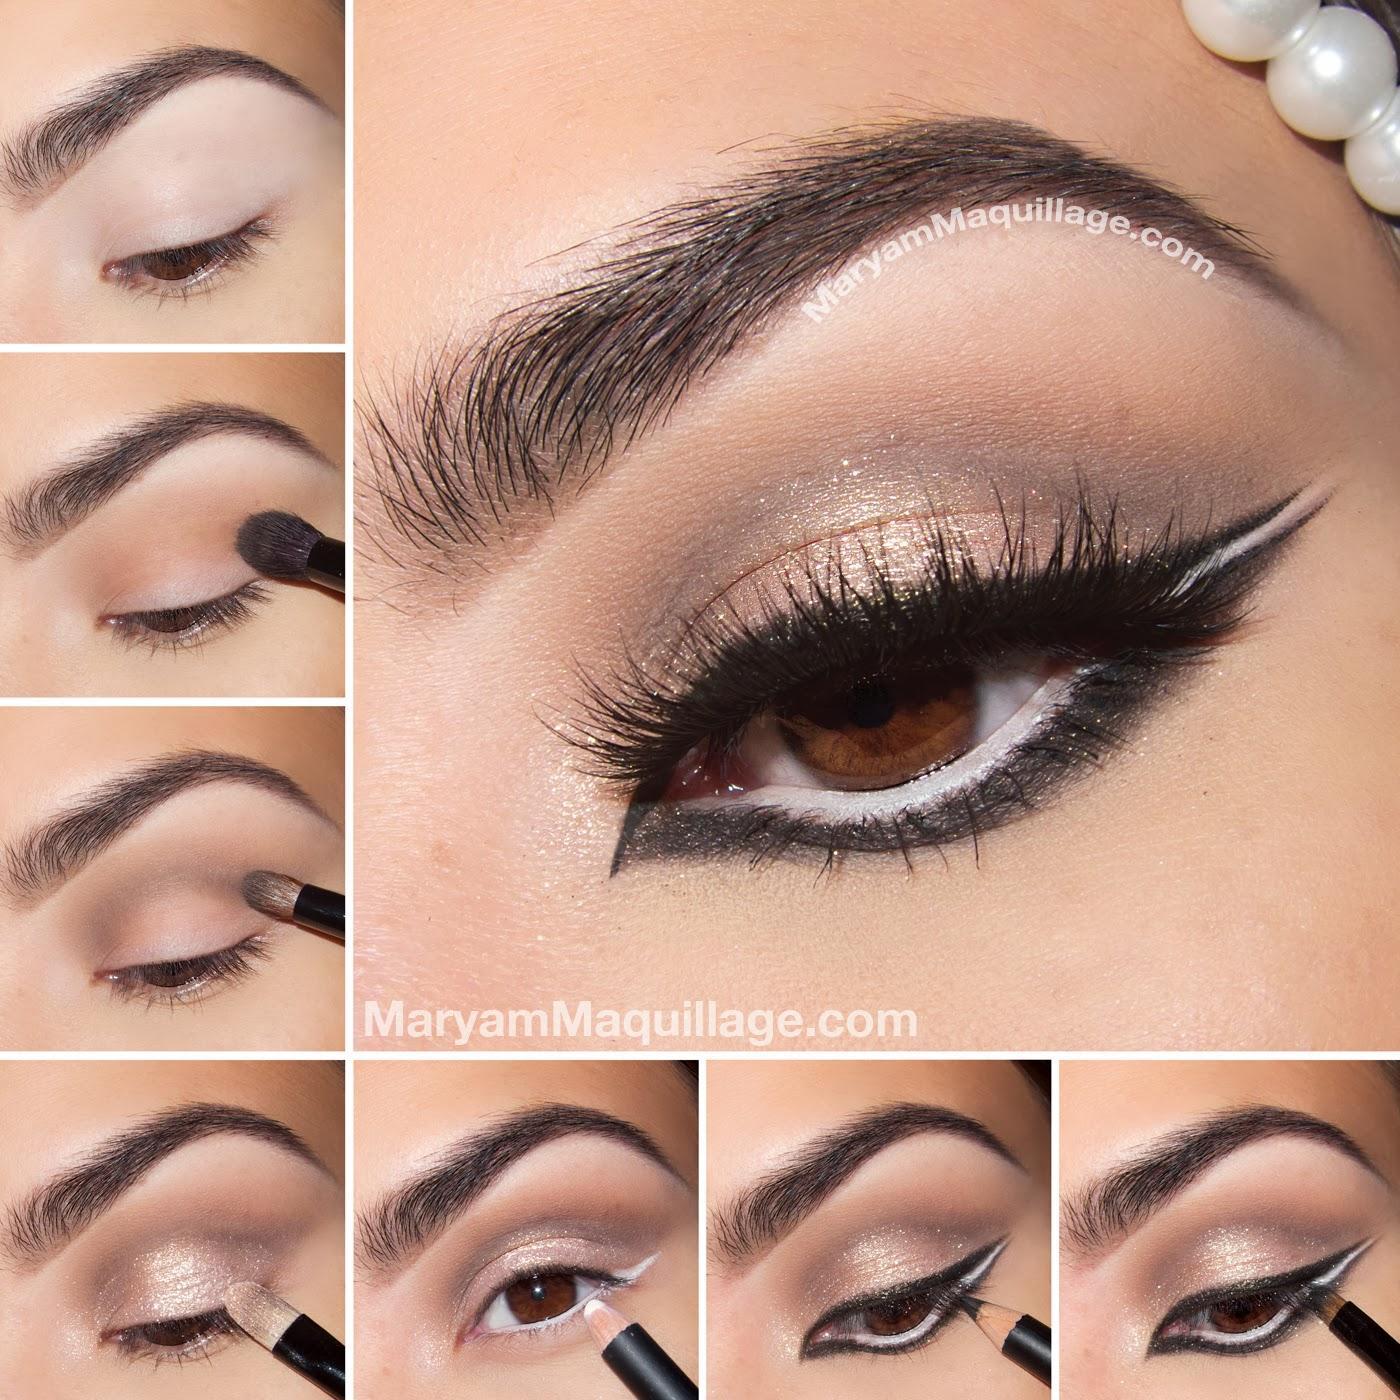 7 - Tuto Maquillage Mariage